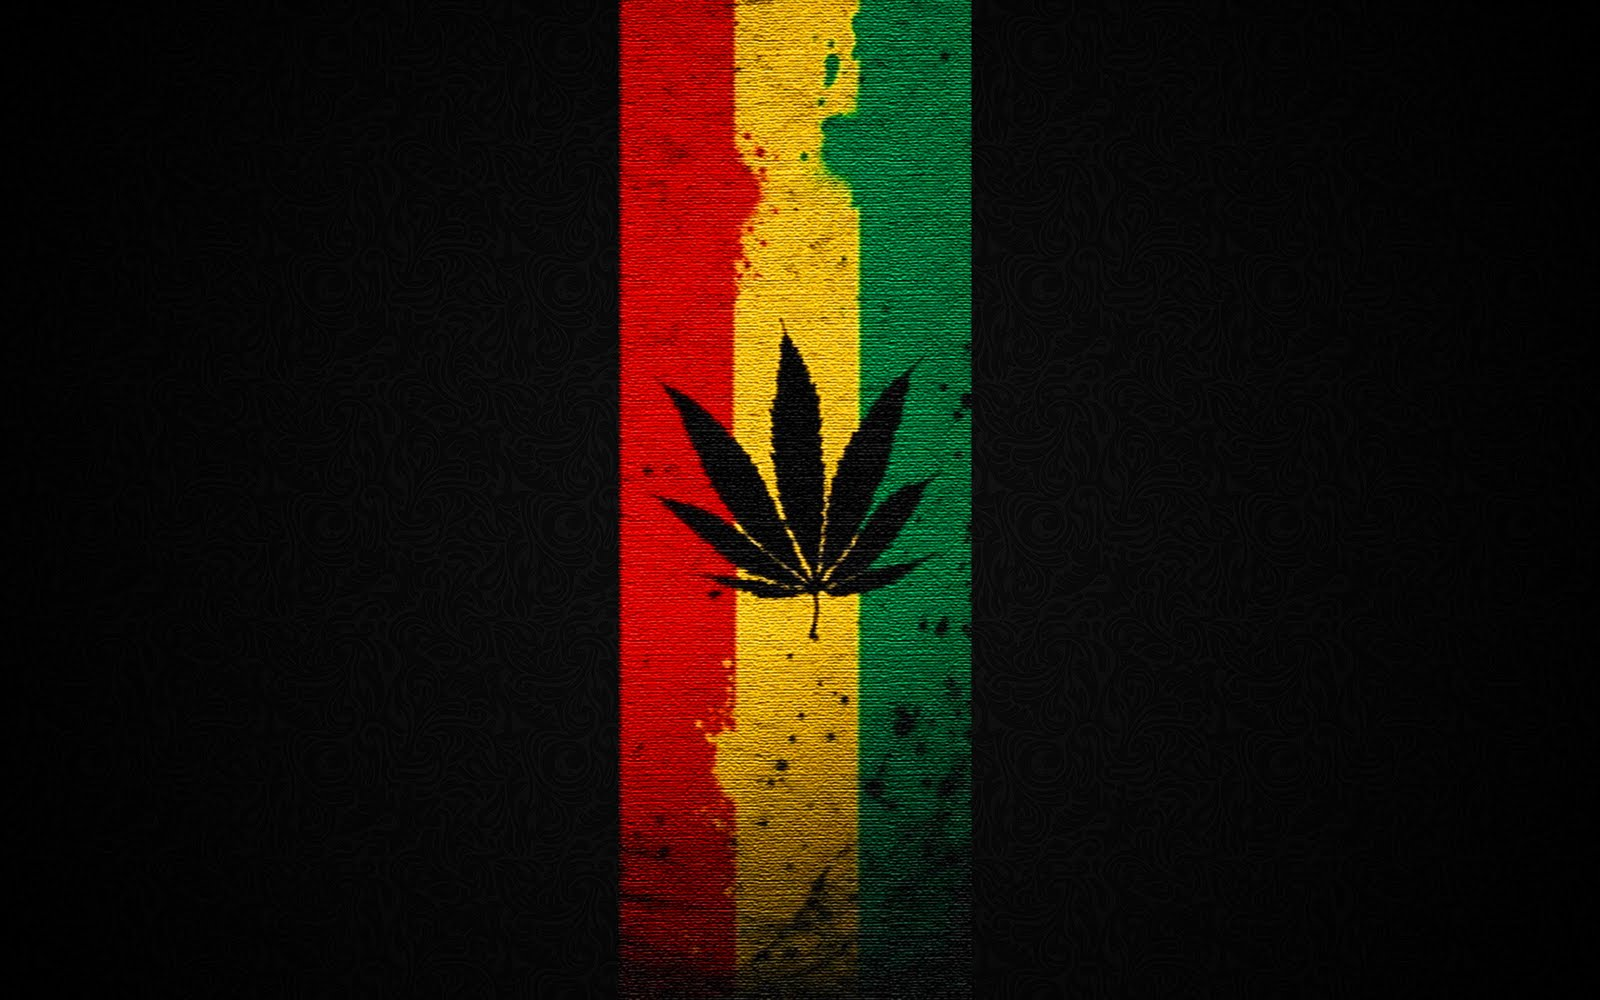 http://2.bp.blogspot.com/-MRCnAt9D_lY/Ti5715VRldI/AAAAAAAAAiY/4Fq3benvFN0/s1600/weed.jpg